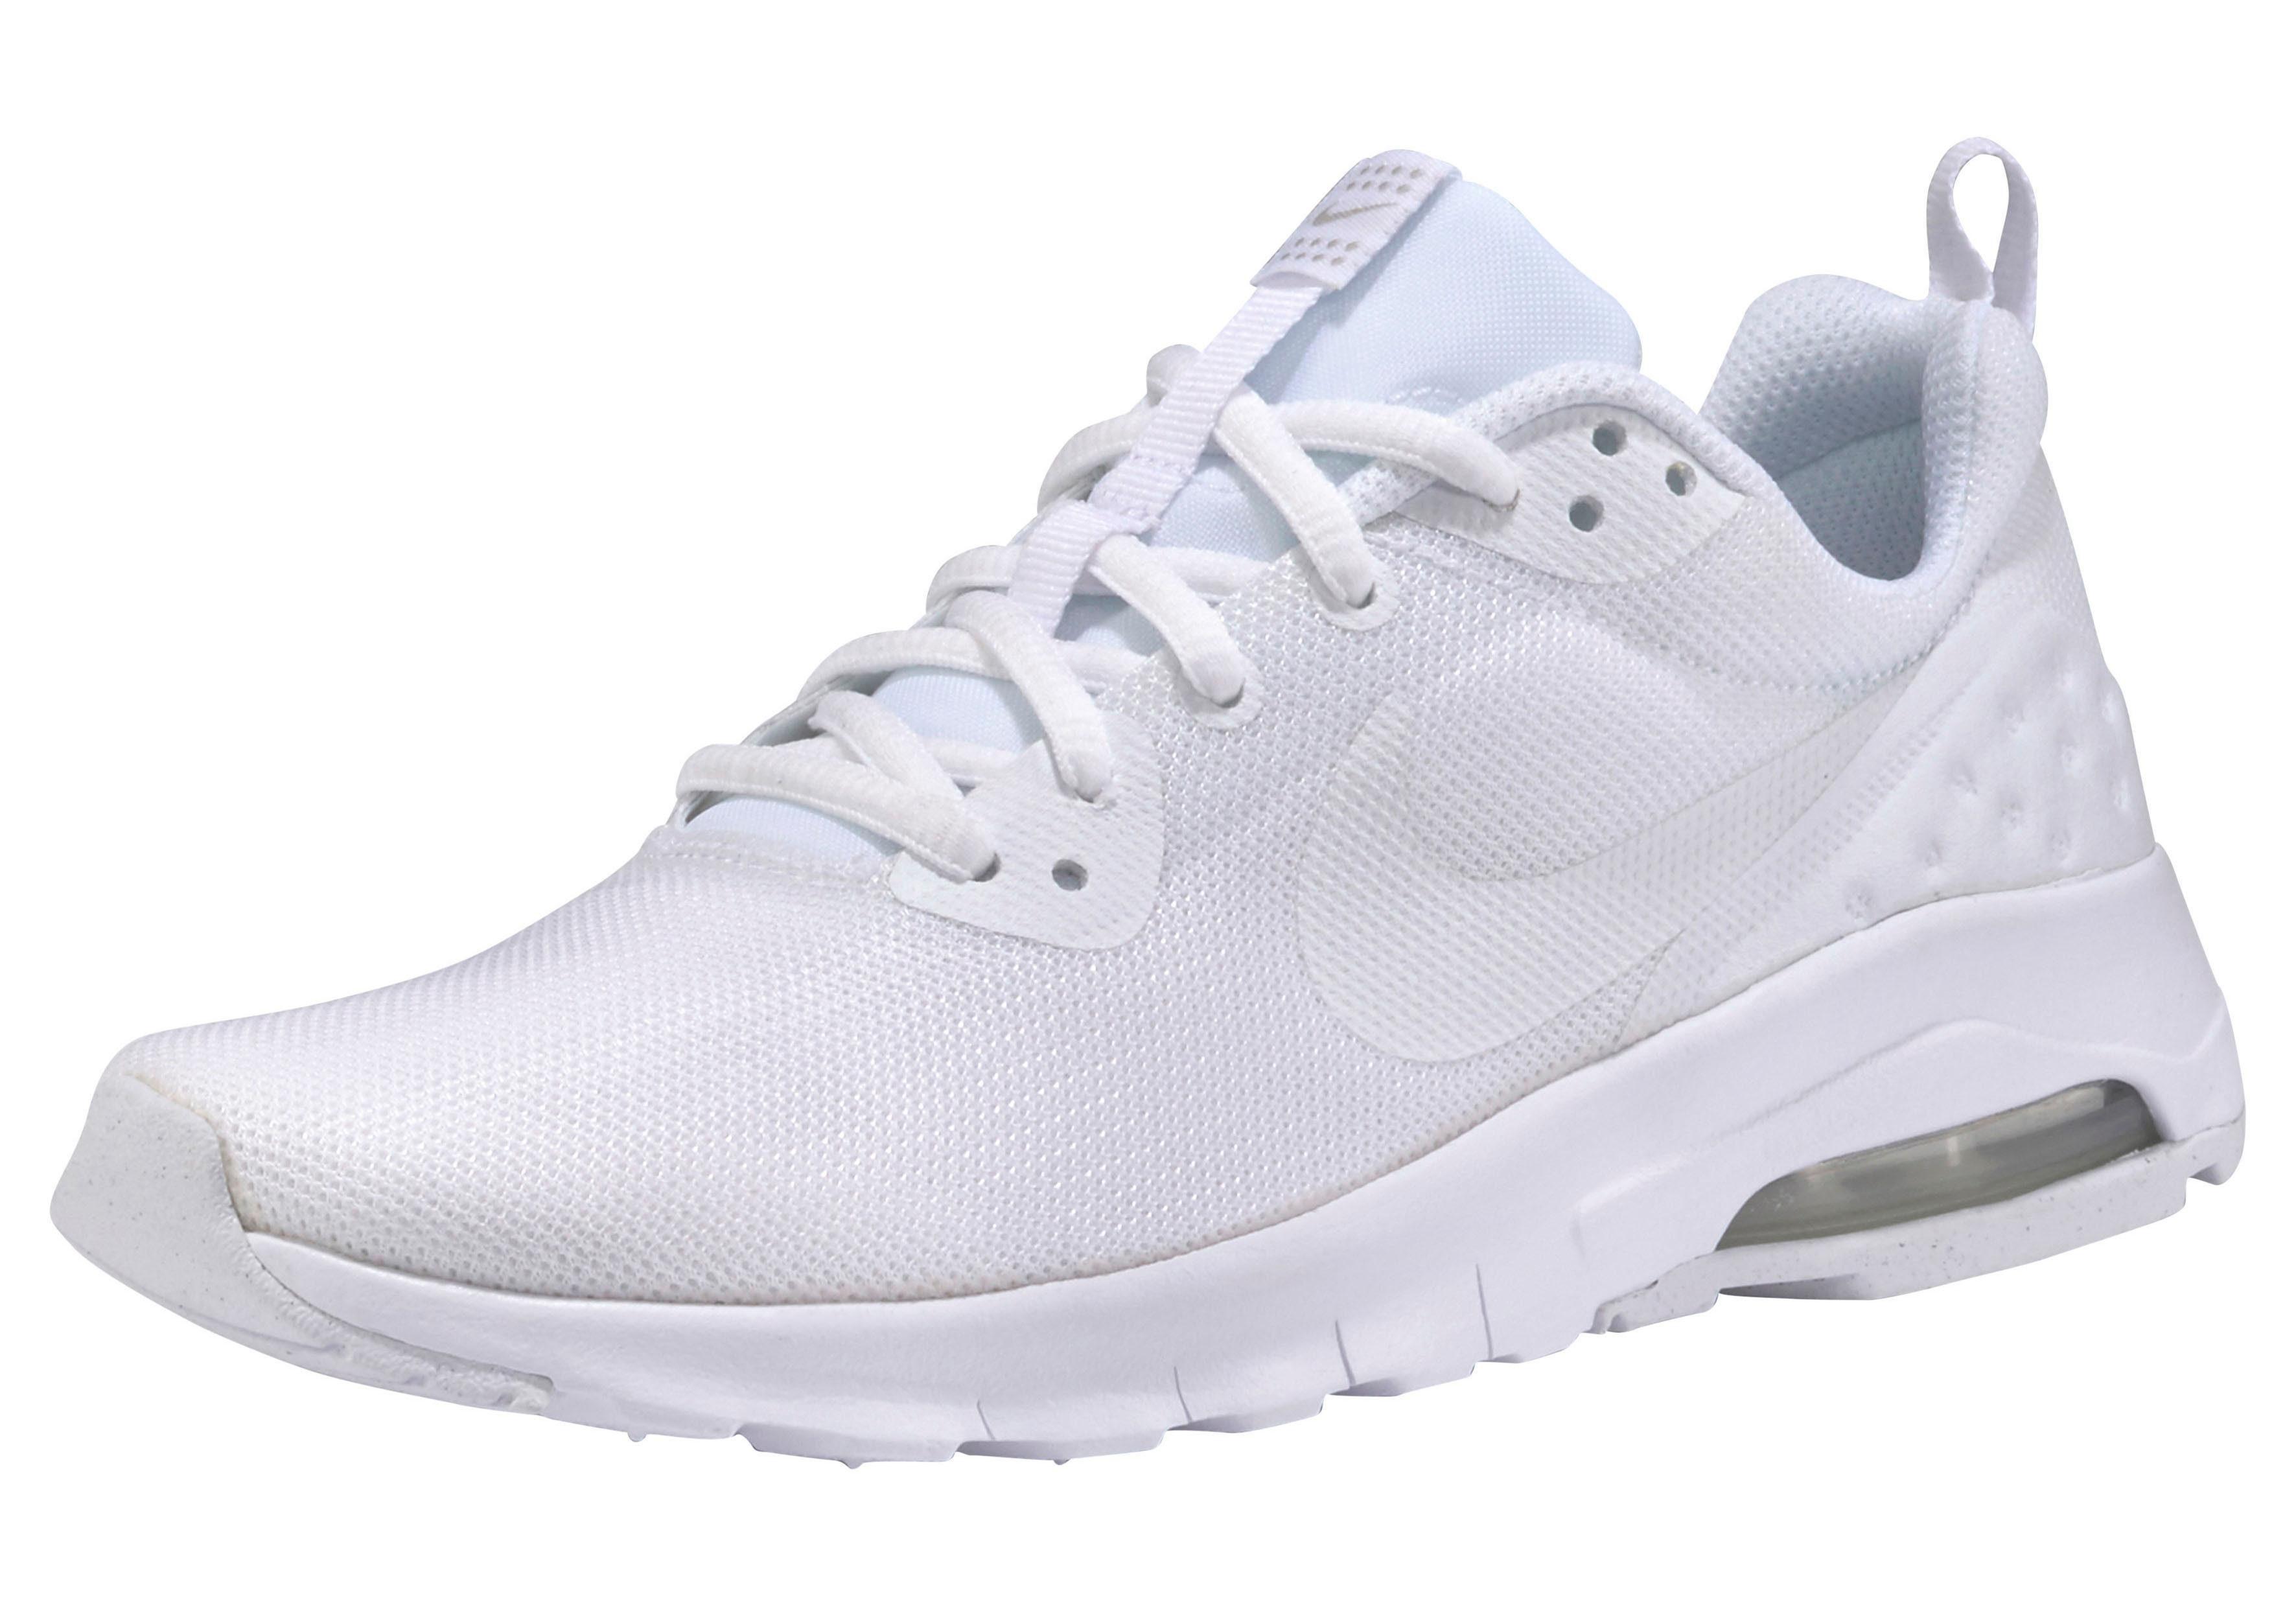 Nike Chaussures De Sport Laag « Mouvement Air Max » Esprit rJBqD